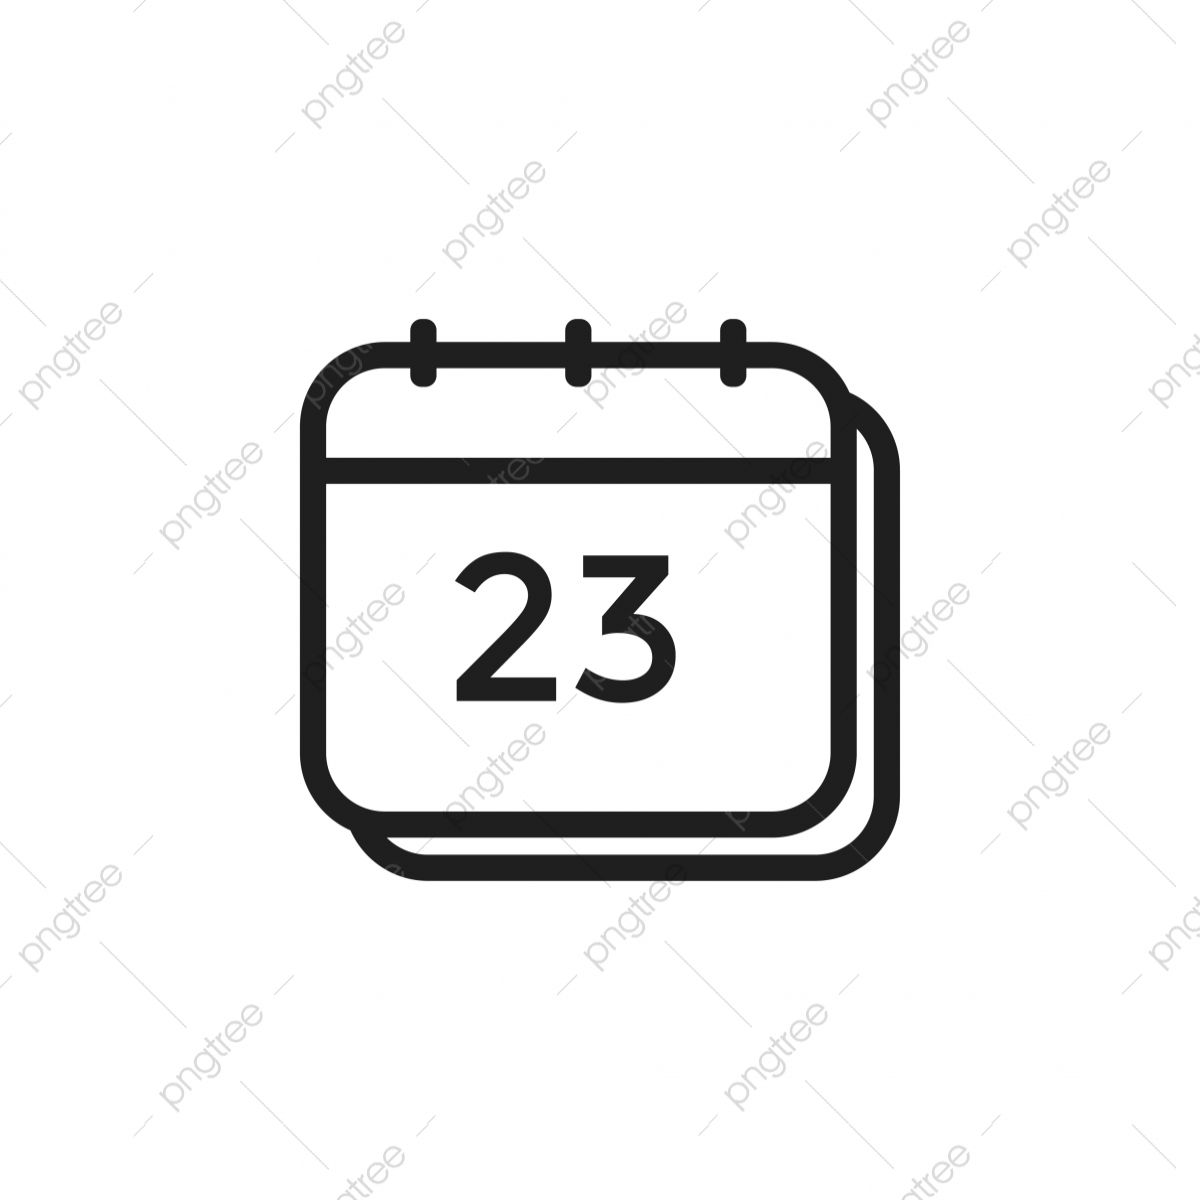 Calendario Clipart.Phone Calendar Phone Clipart Calendar Clipart Png